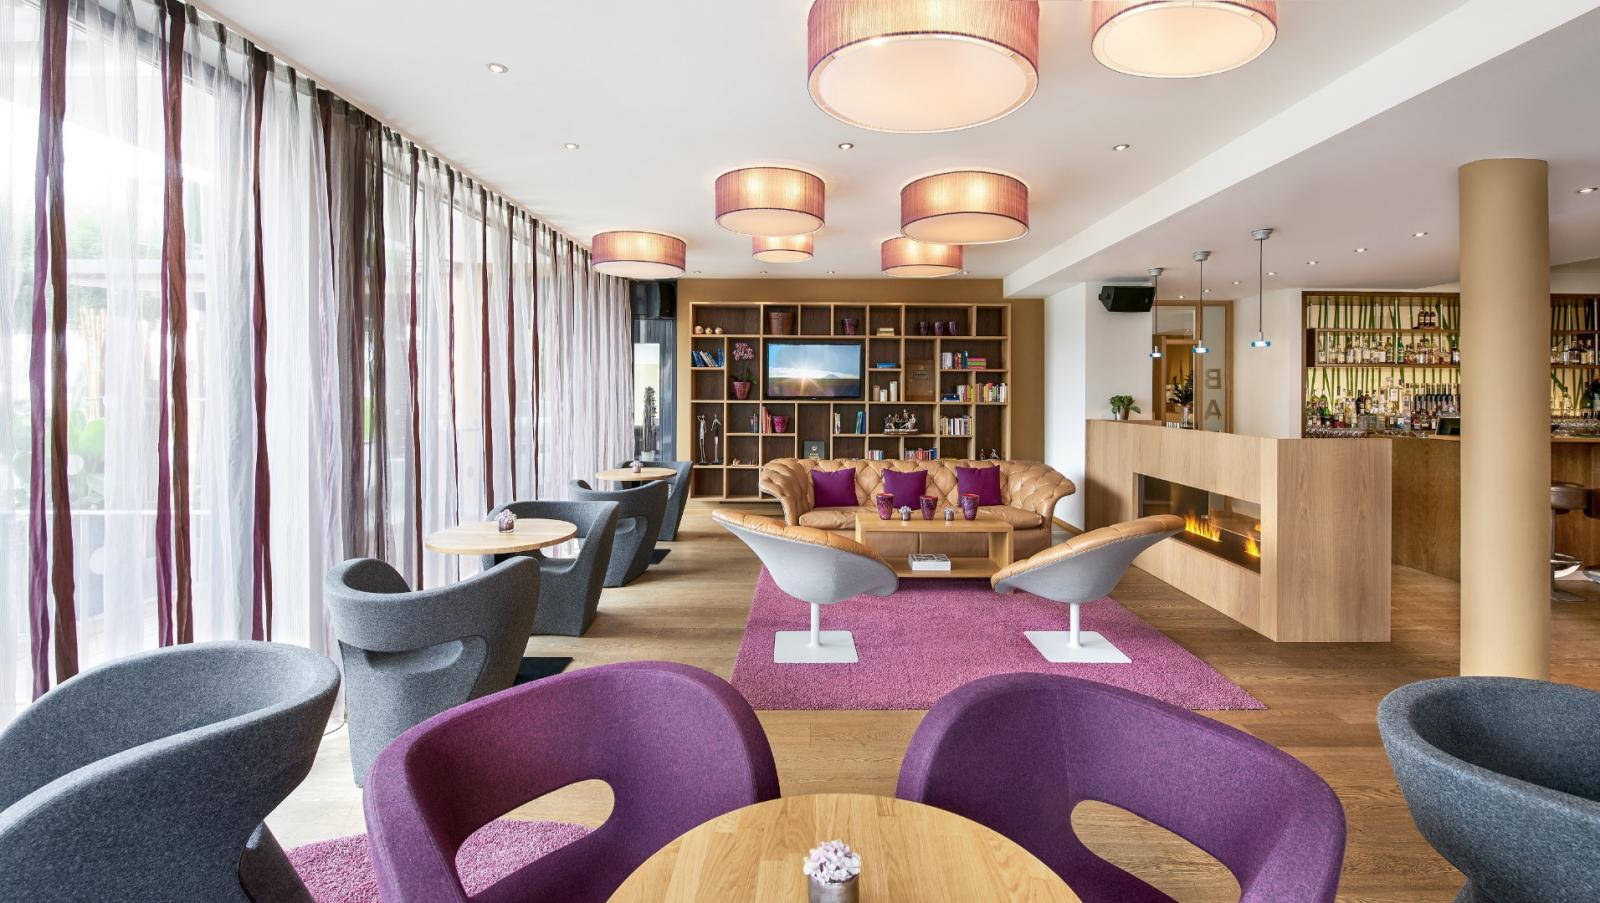 Bilder Hotel Am See Neubau